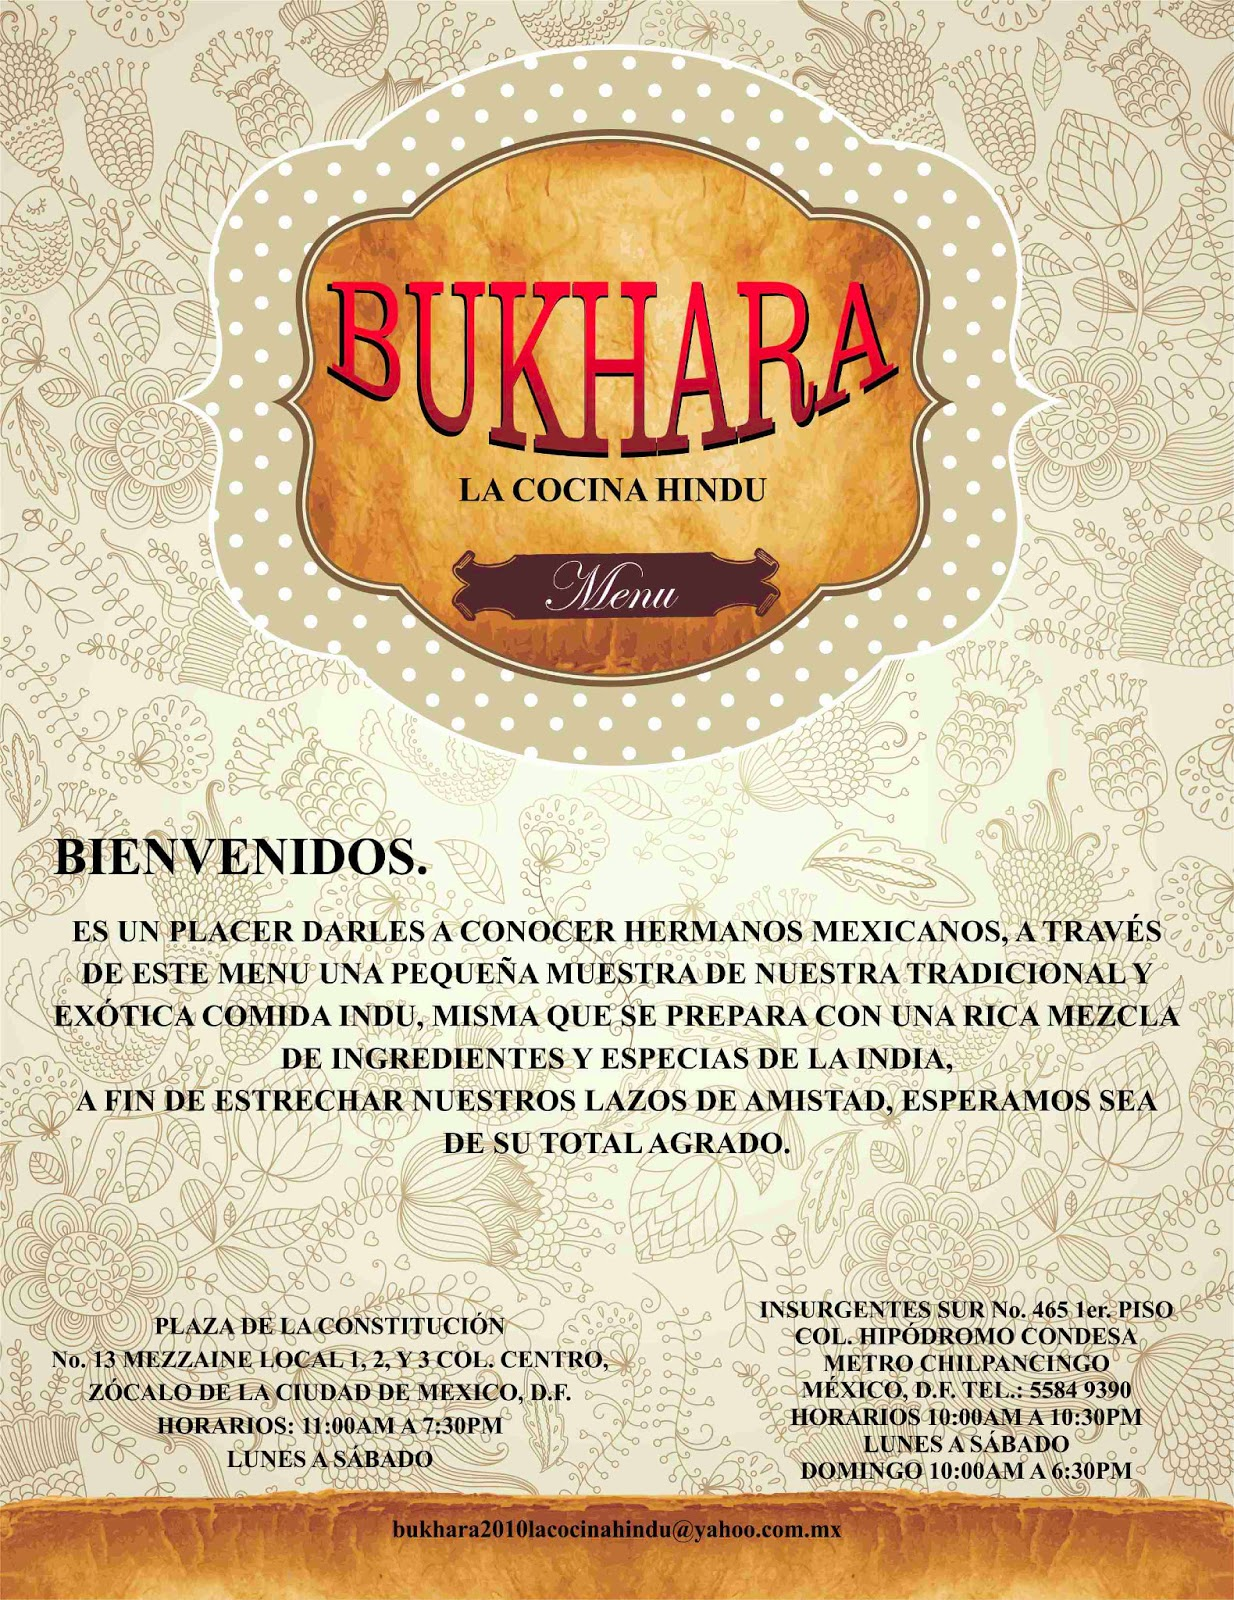 BUKHARA LA PARILLA HINDU ,ZOCALO, MEXICO CITY: BUKHARA COCINA HINDU